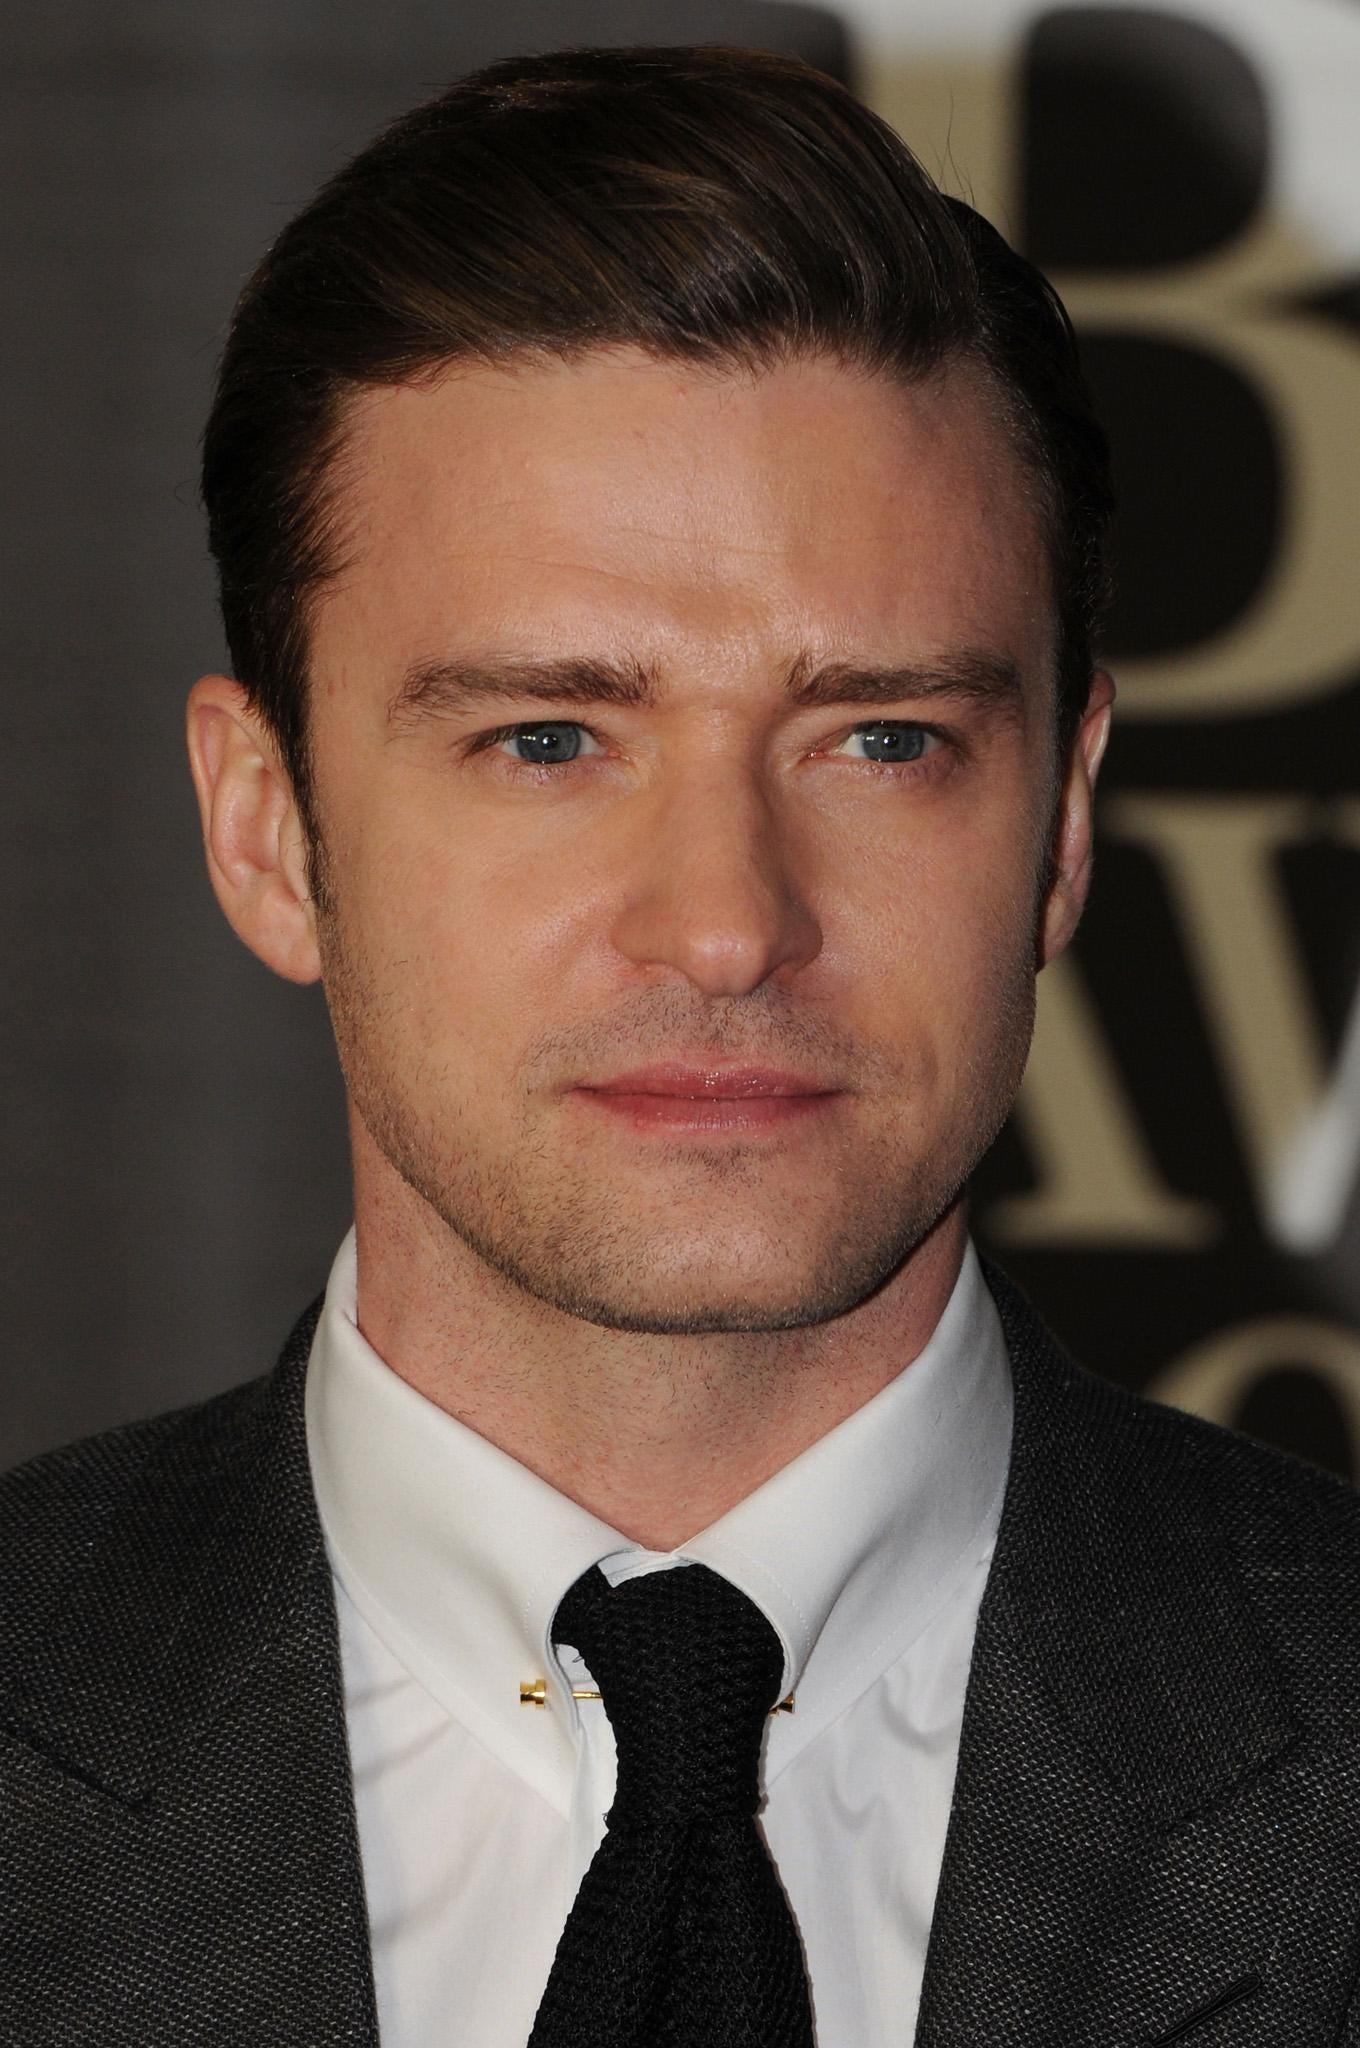 Justin Timberlake arrives at the Brit Awards 2013